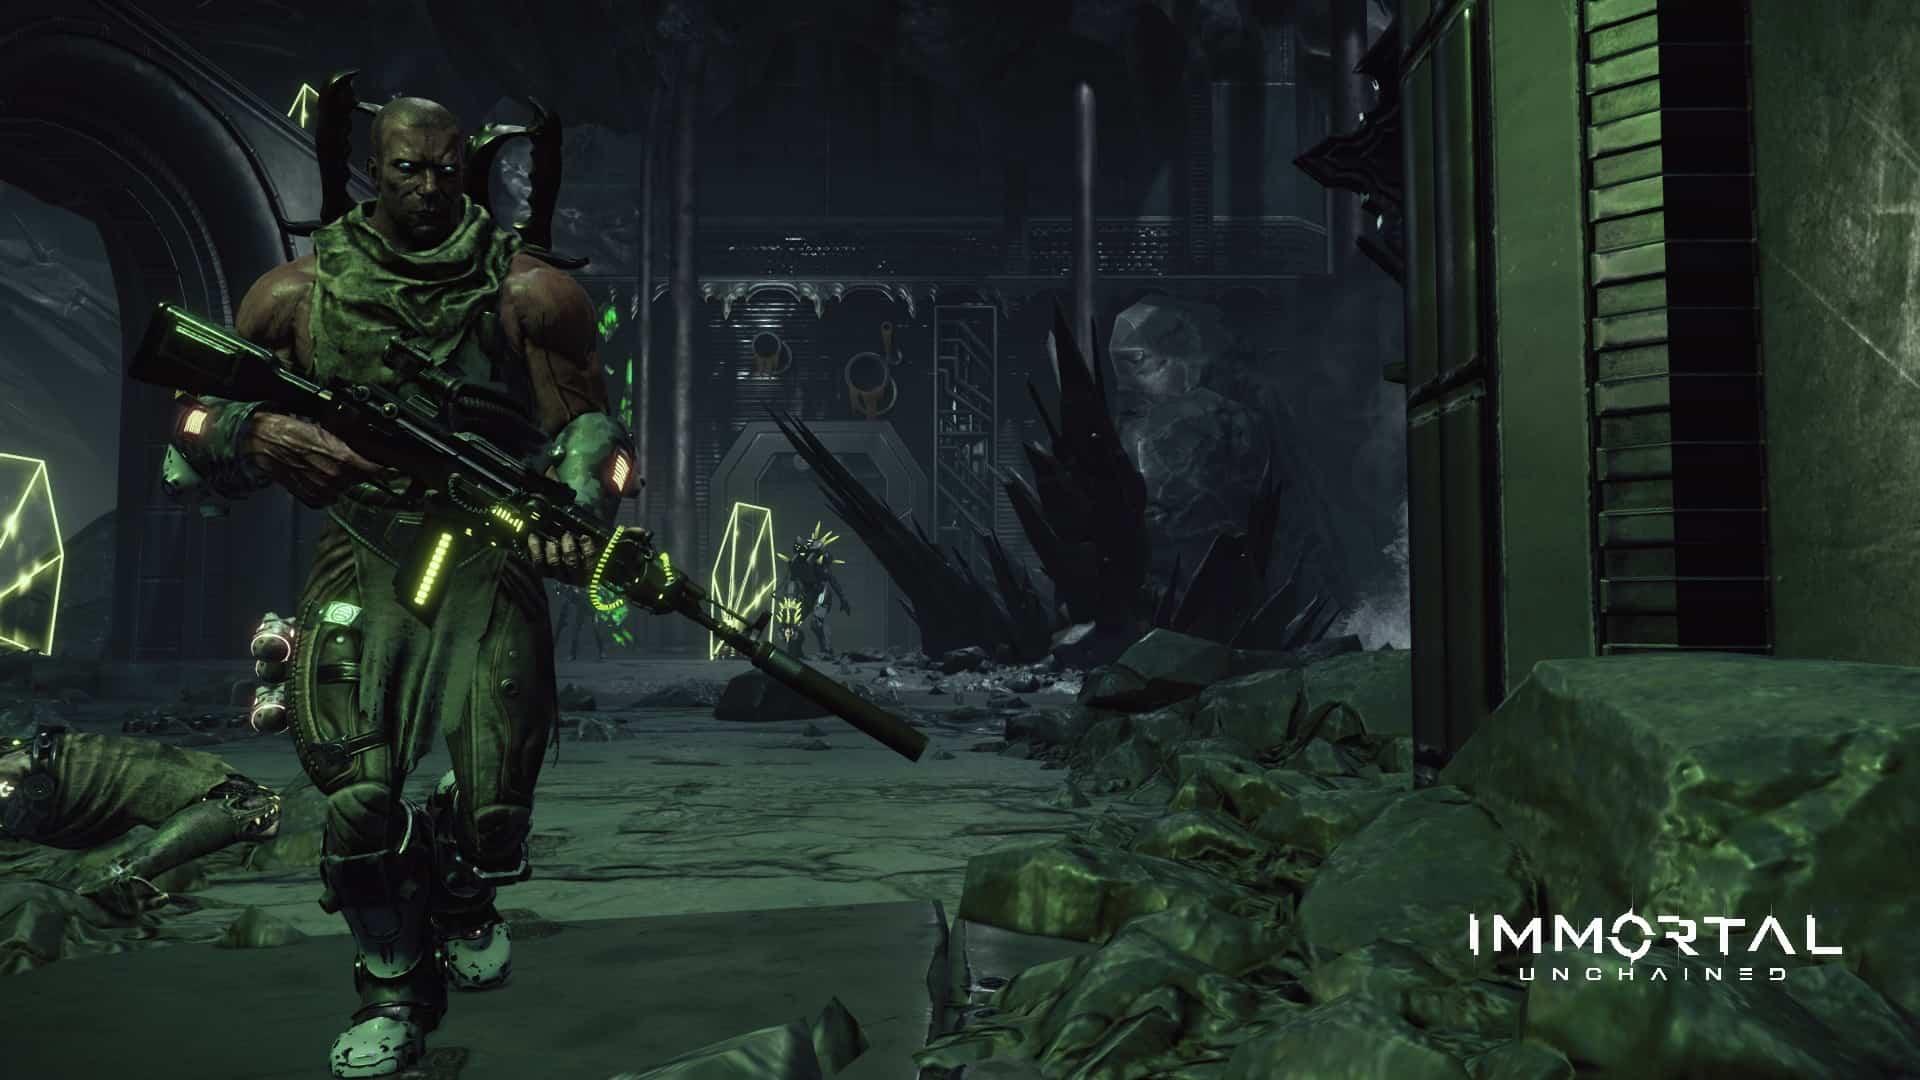 Immortal Unchained Alpha Screensot1 - Immortal: Unchained avrà una closed beta a Marzo